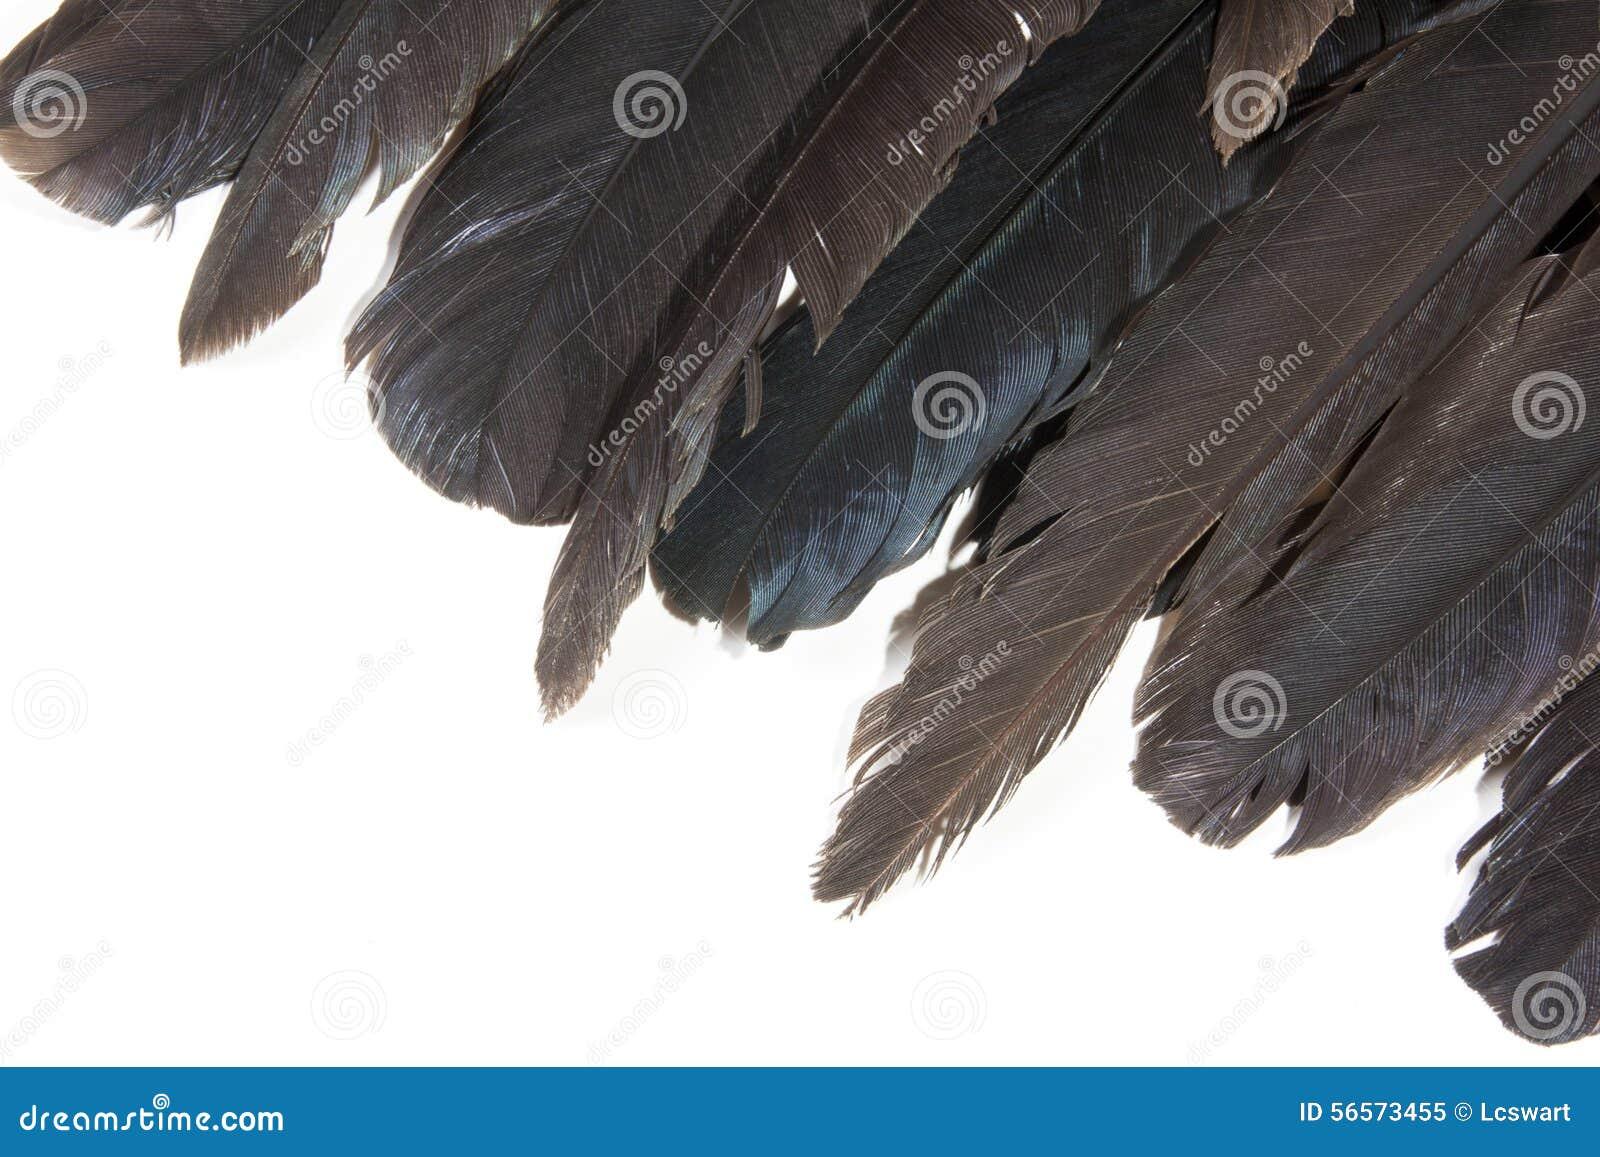 Download Ποικιλίες βαθμών του χρώματος που απεικονίζονται στις άκρες των φτερών πουλιών Στοκ Εικόνα - εικόνα από απομονωμένος, συλλογή: 56573455